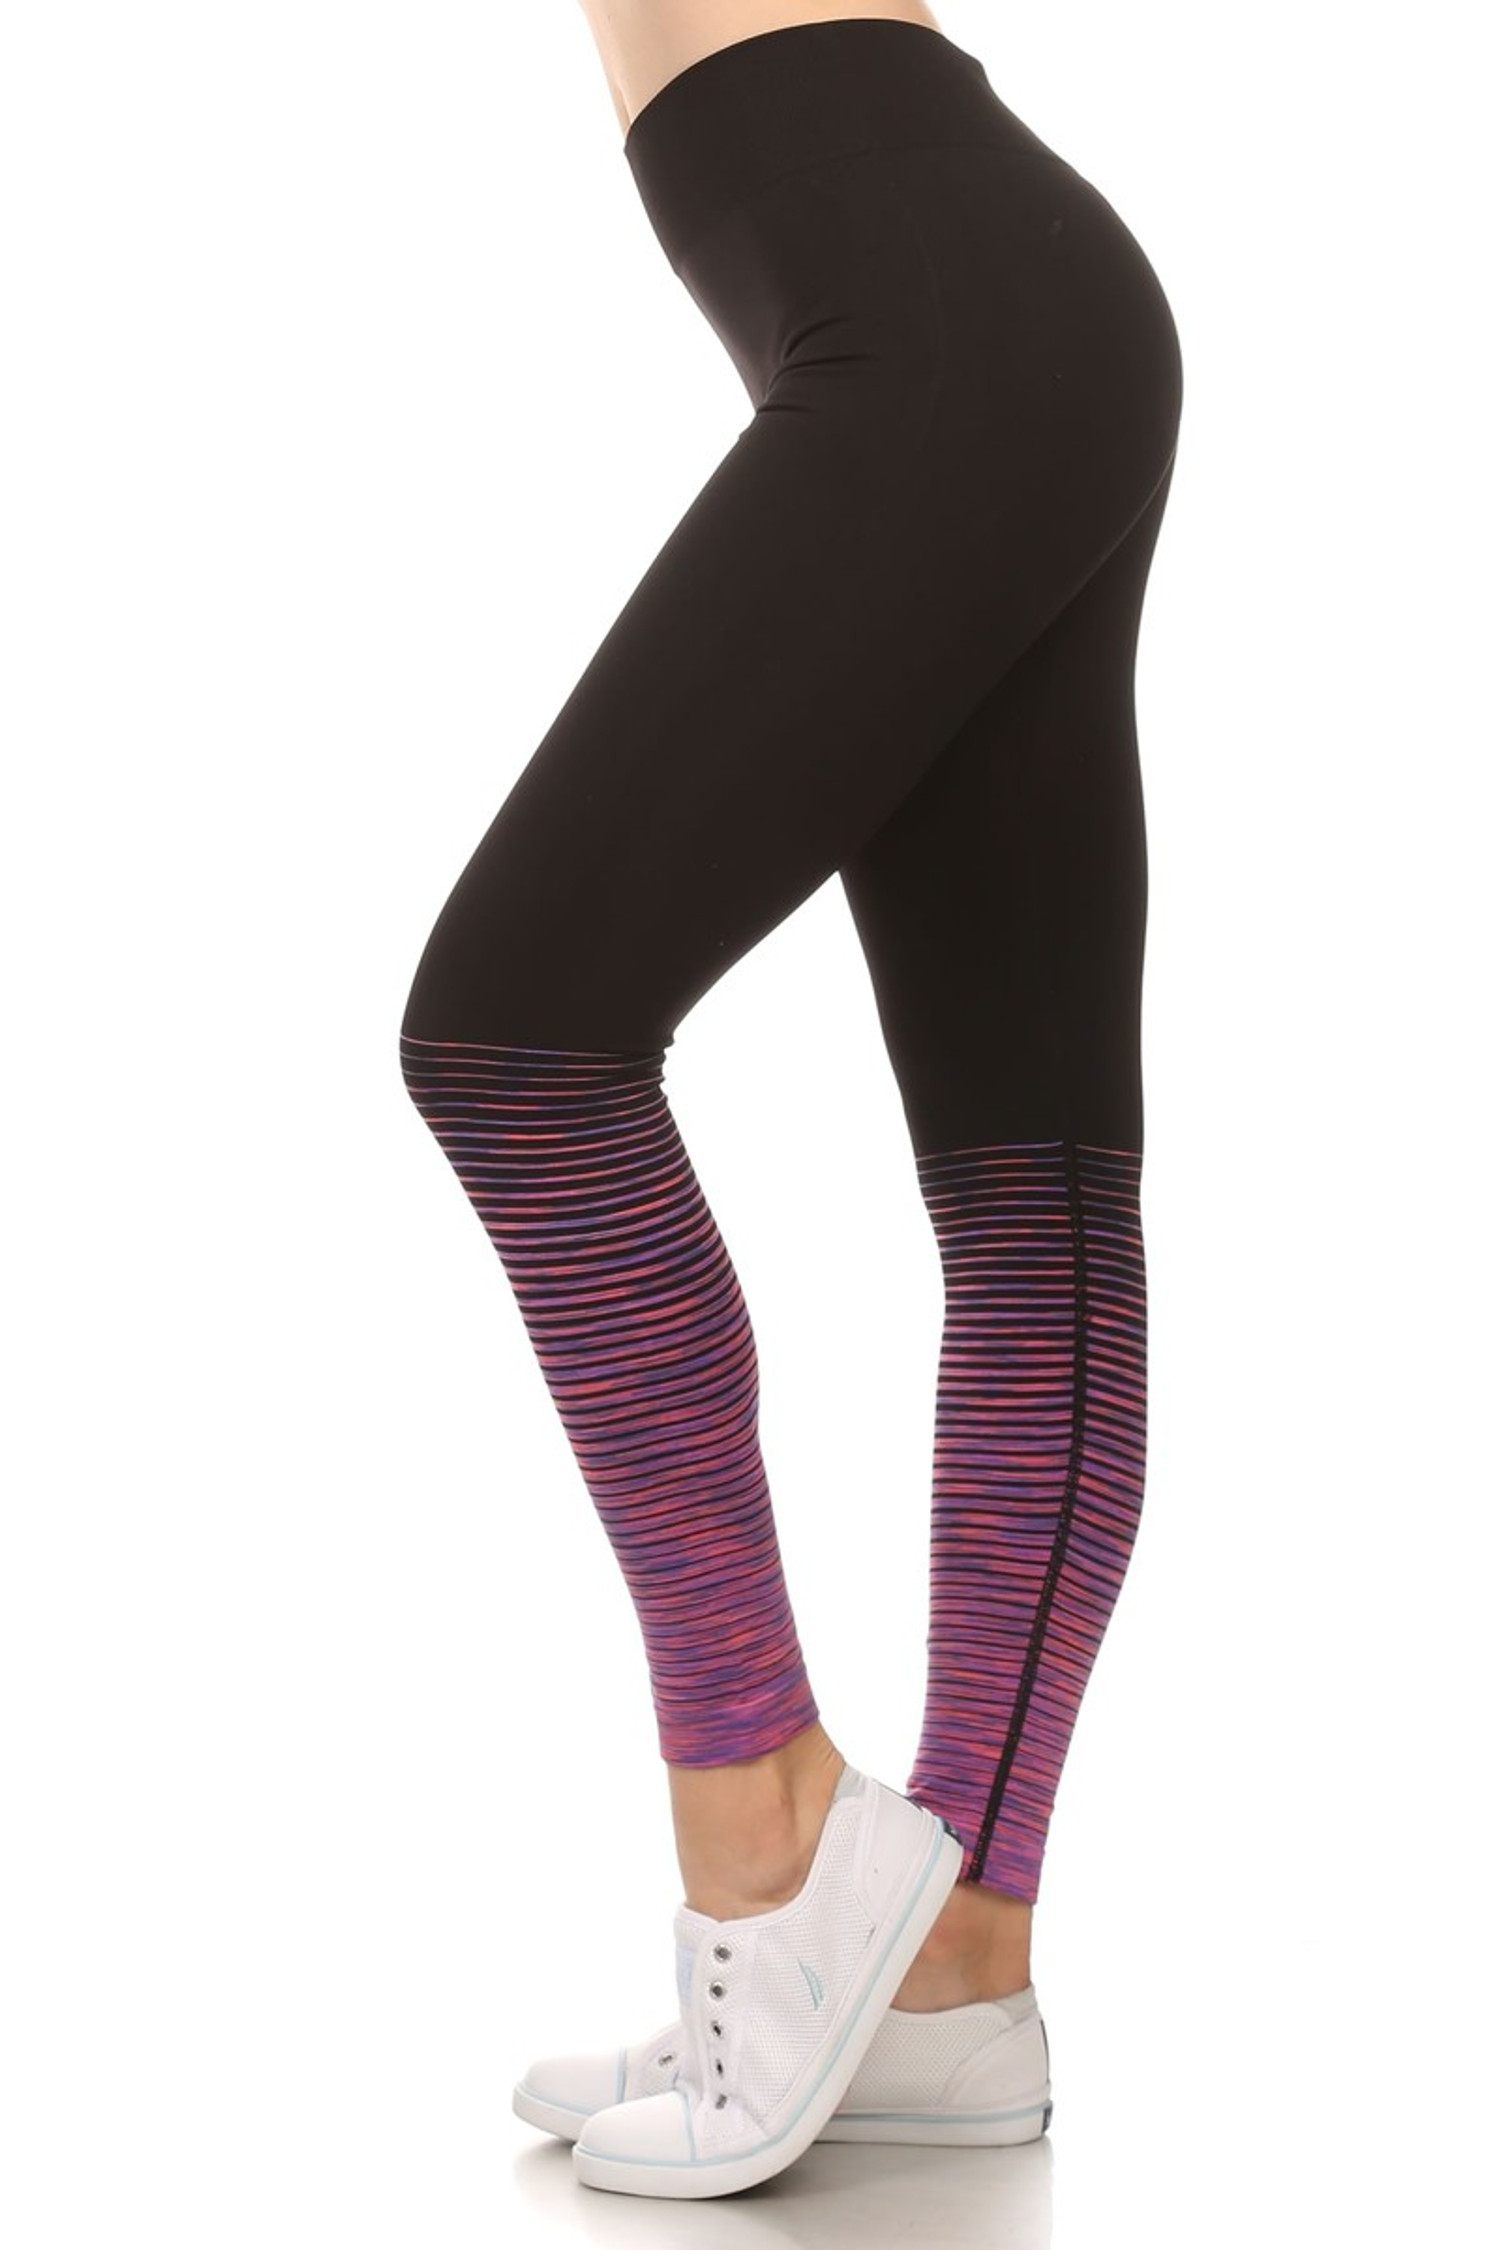 Purple Tornado Color Fade Workout Leggings